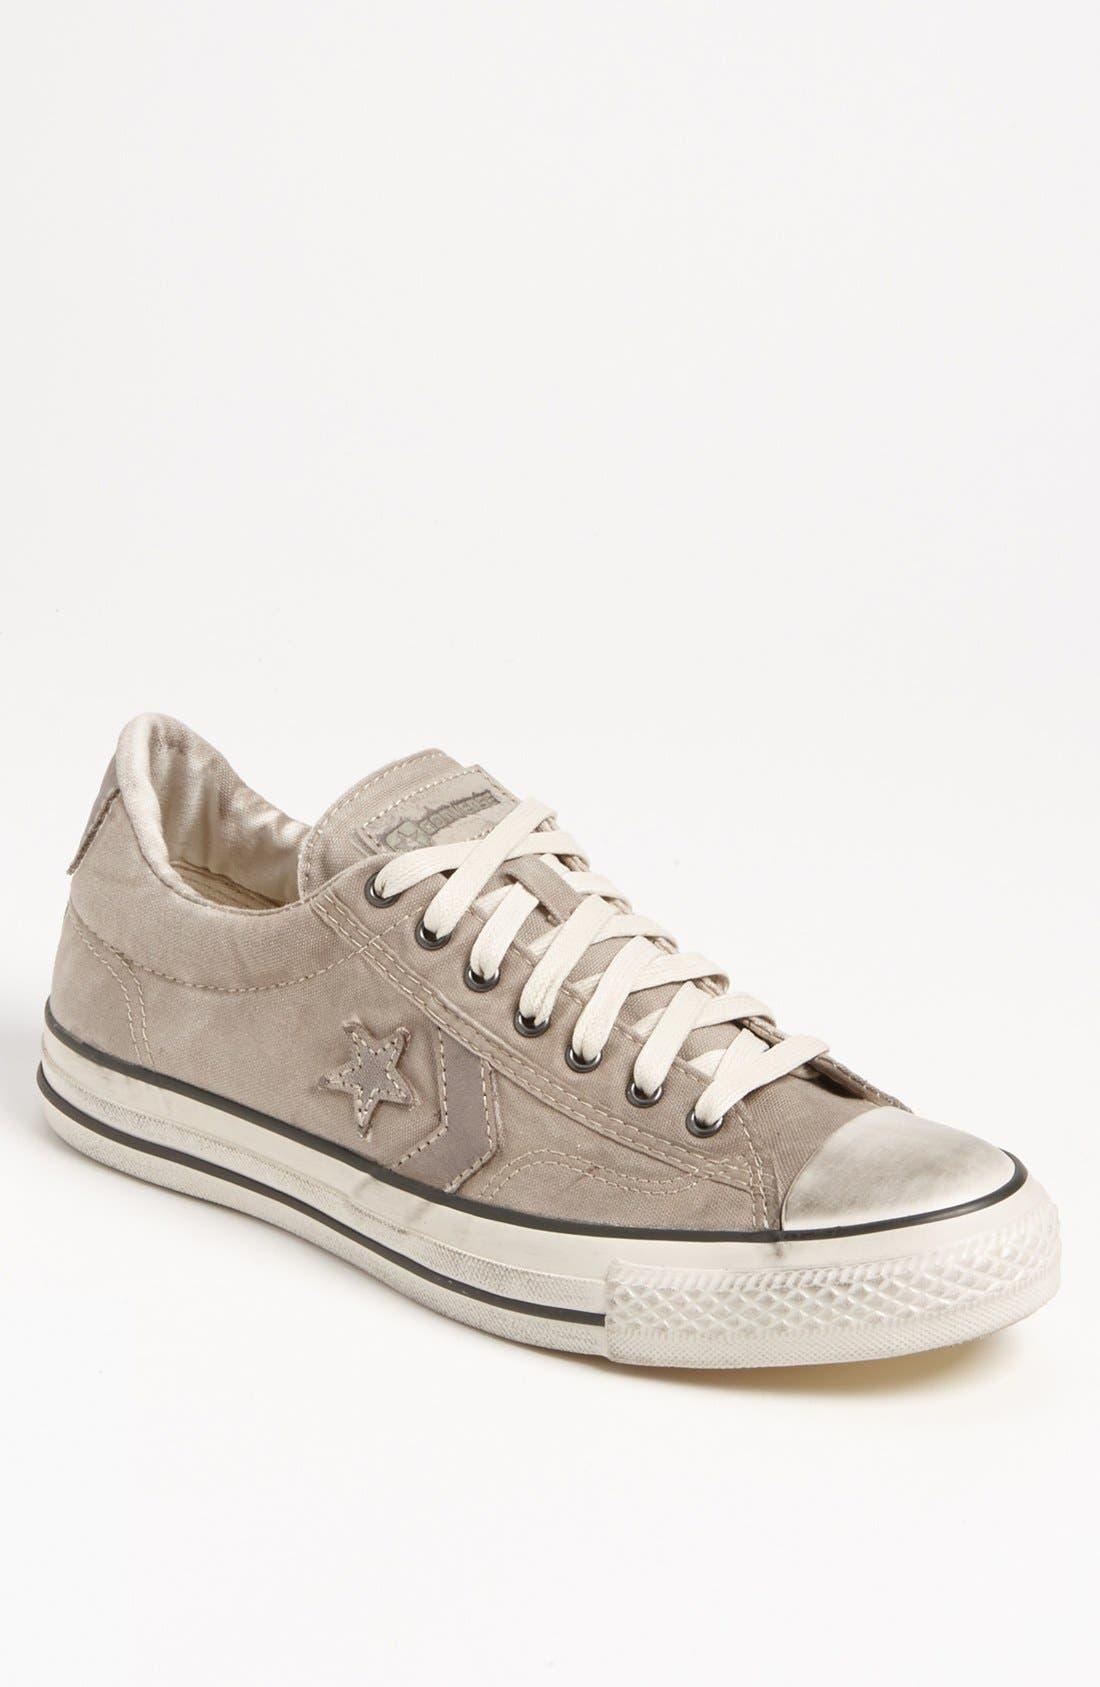 Main Image - Converse by John Varvatos 'JV Star Player' Sneaker (Men)